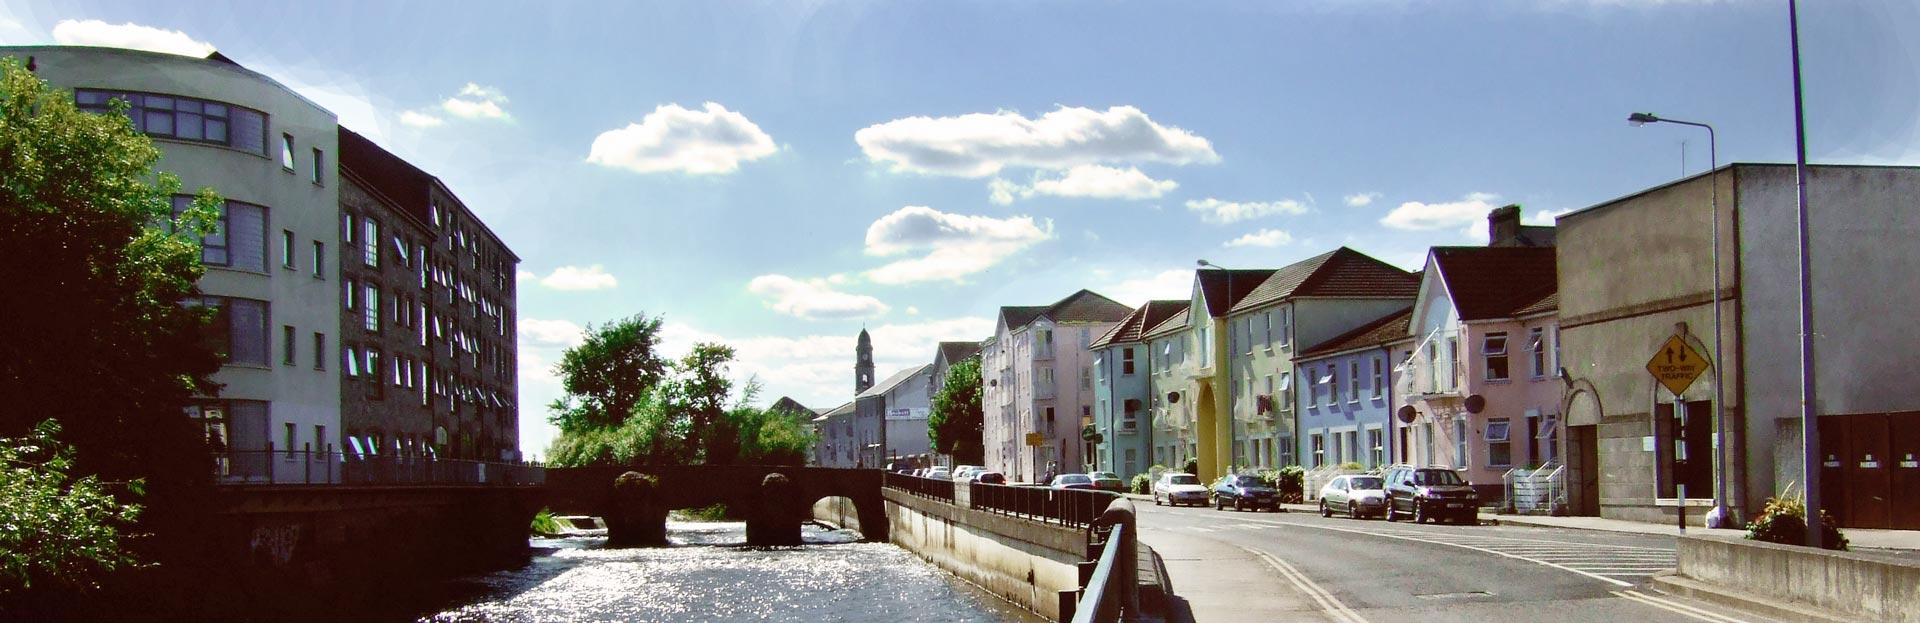 clonmel-street-river